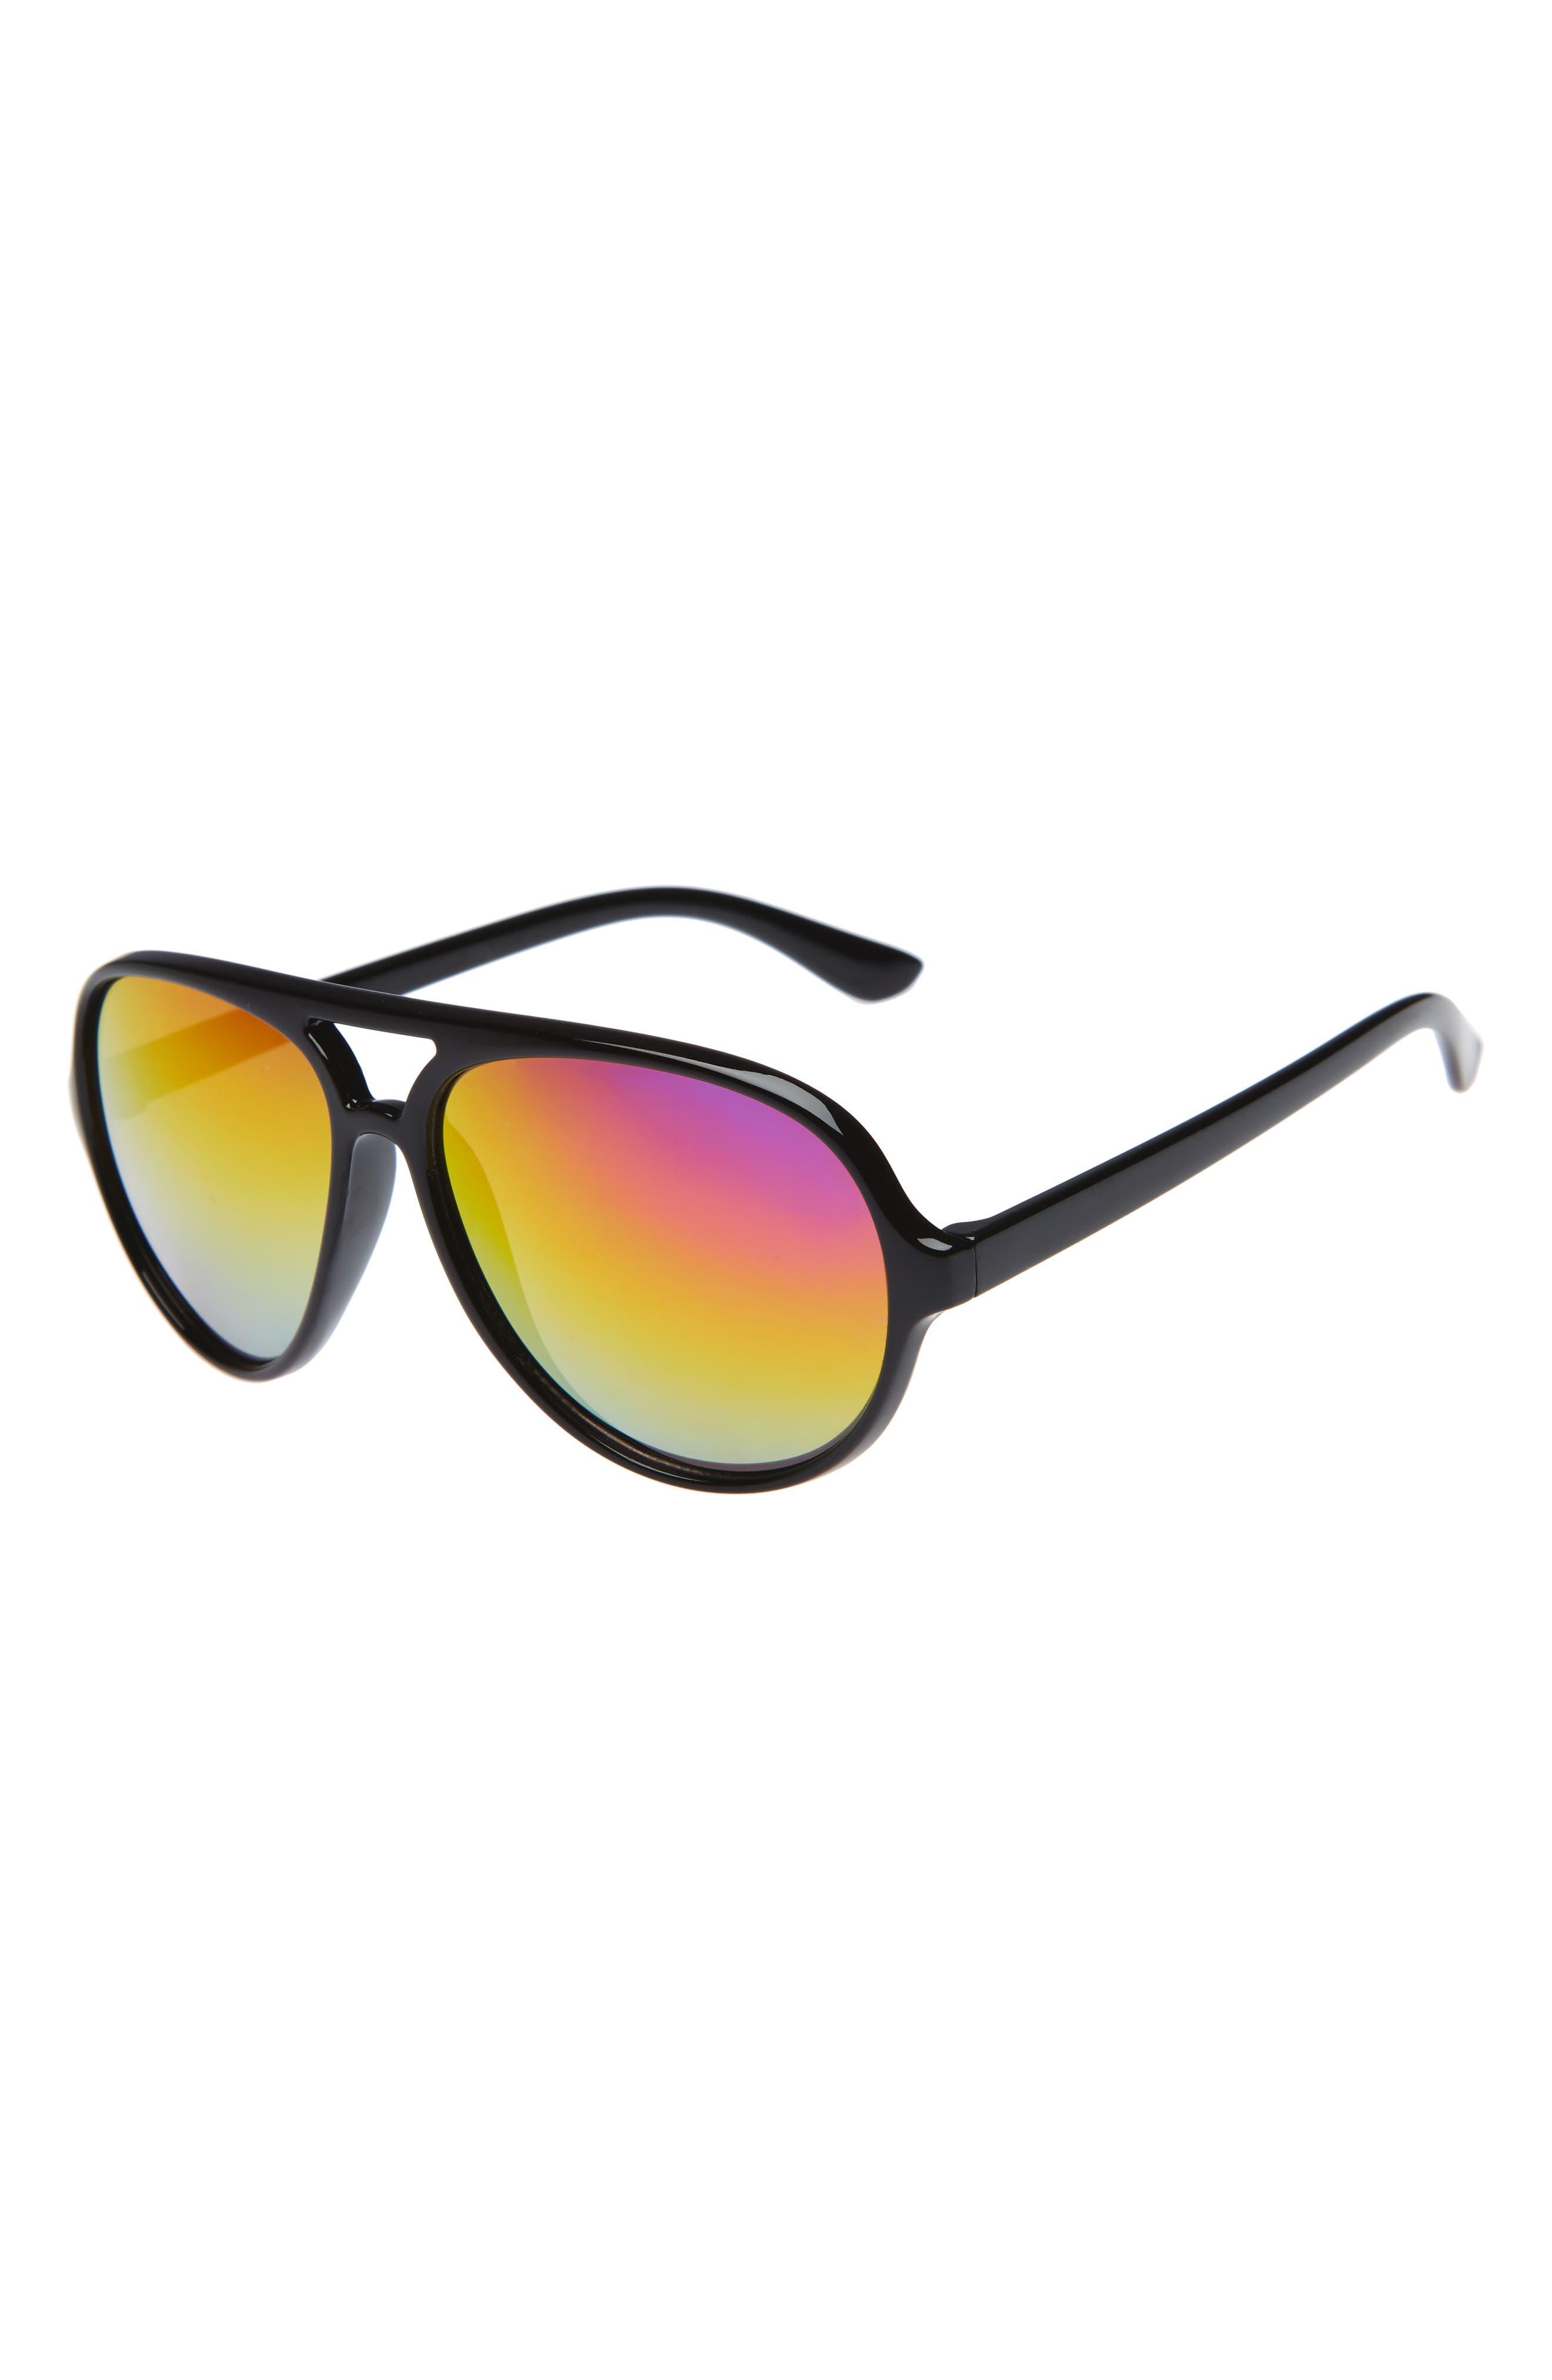 Mirrored Aviator Sunglasses,                             Main thumbnail 1, color,                             Black